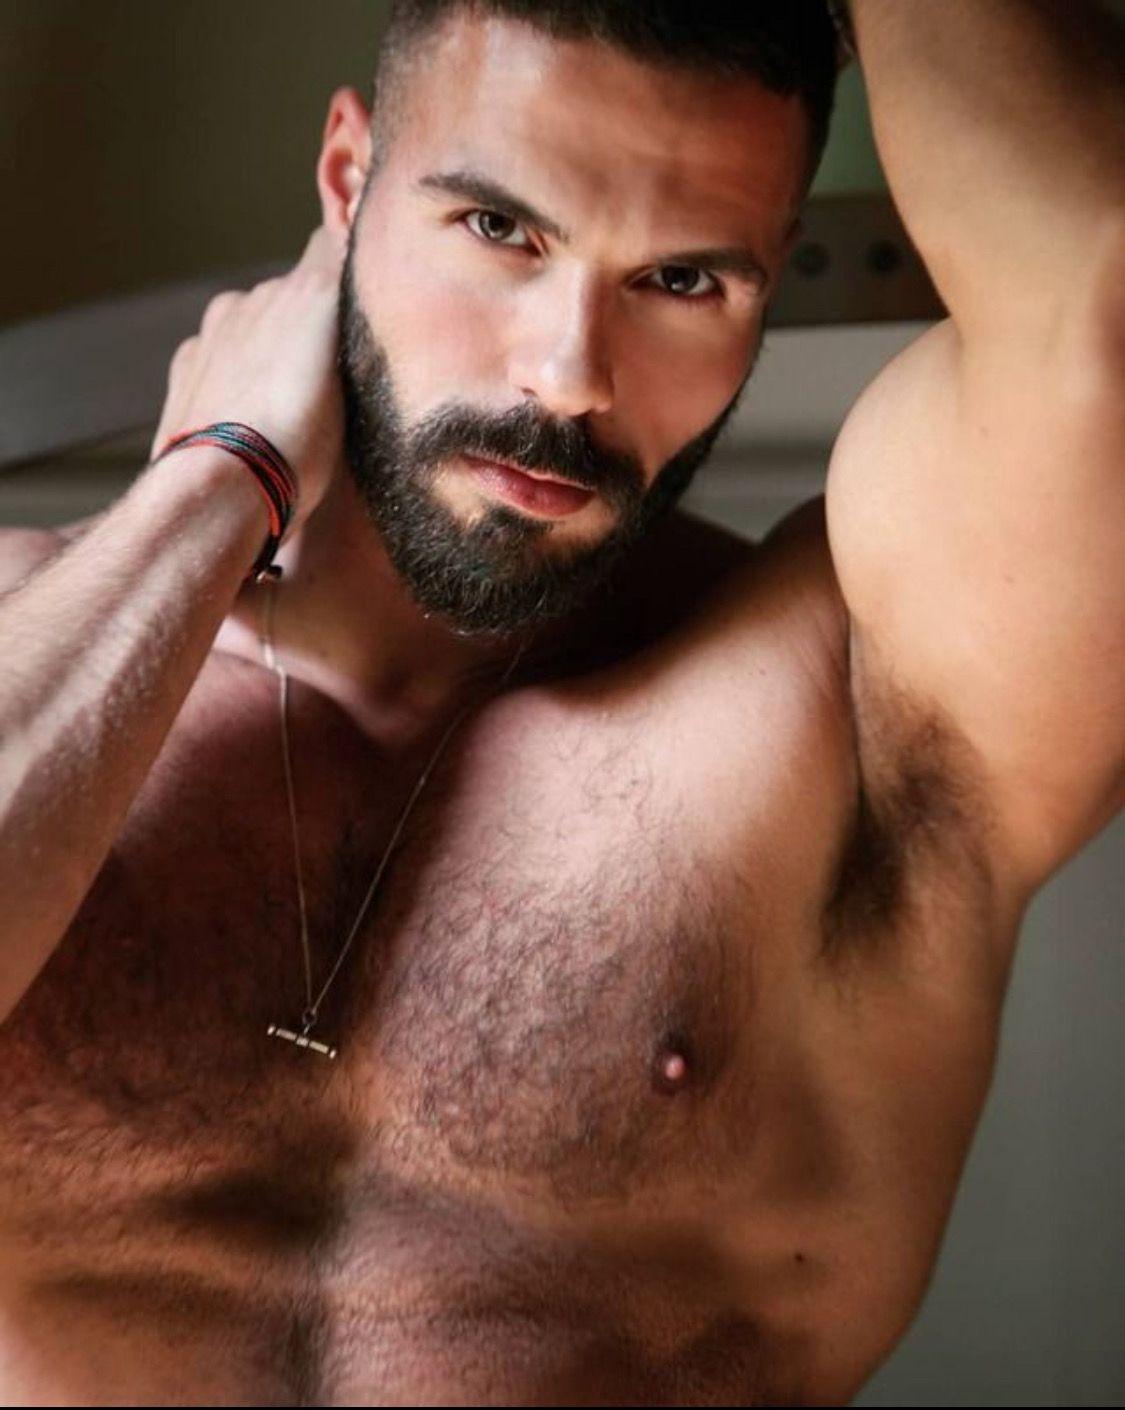 Grizzly gay men videos